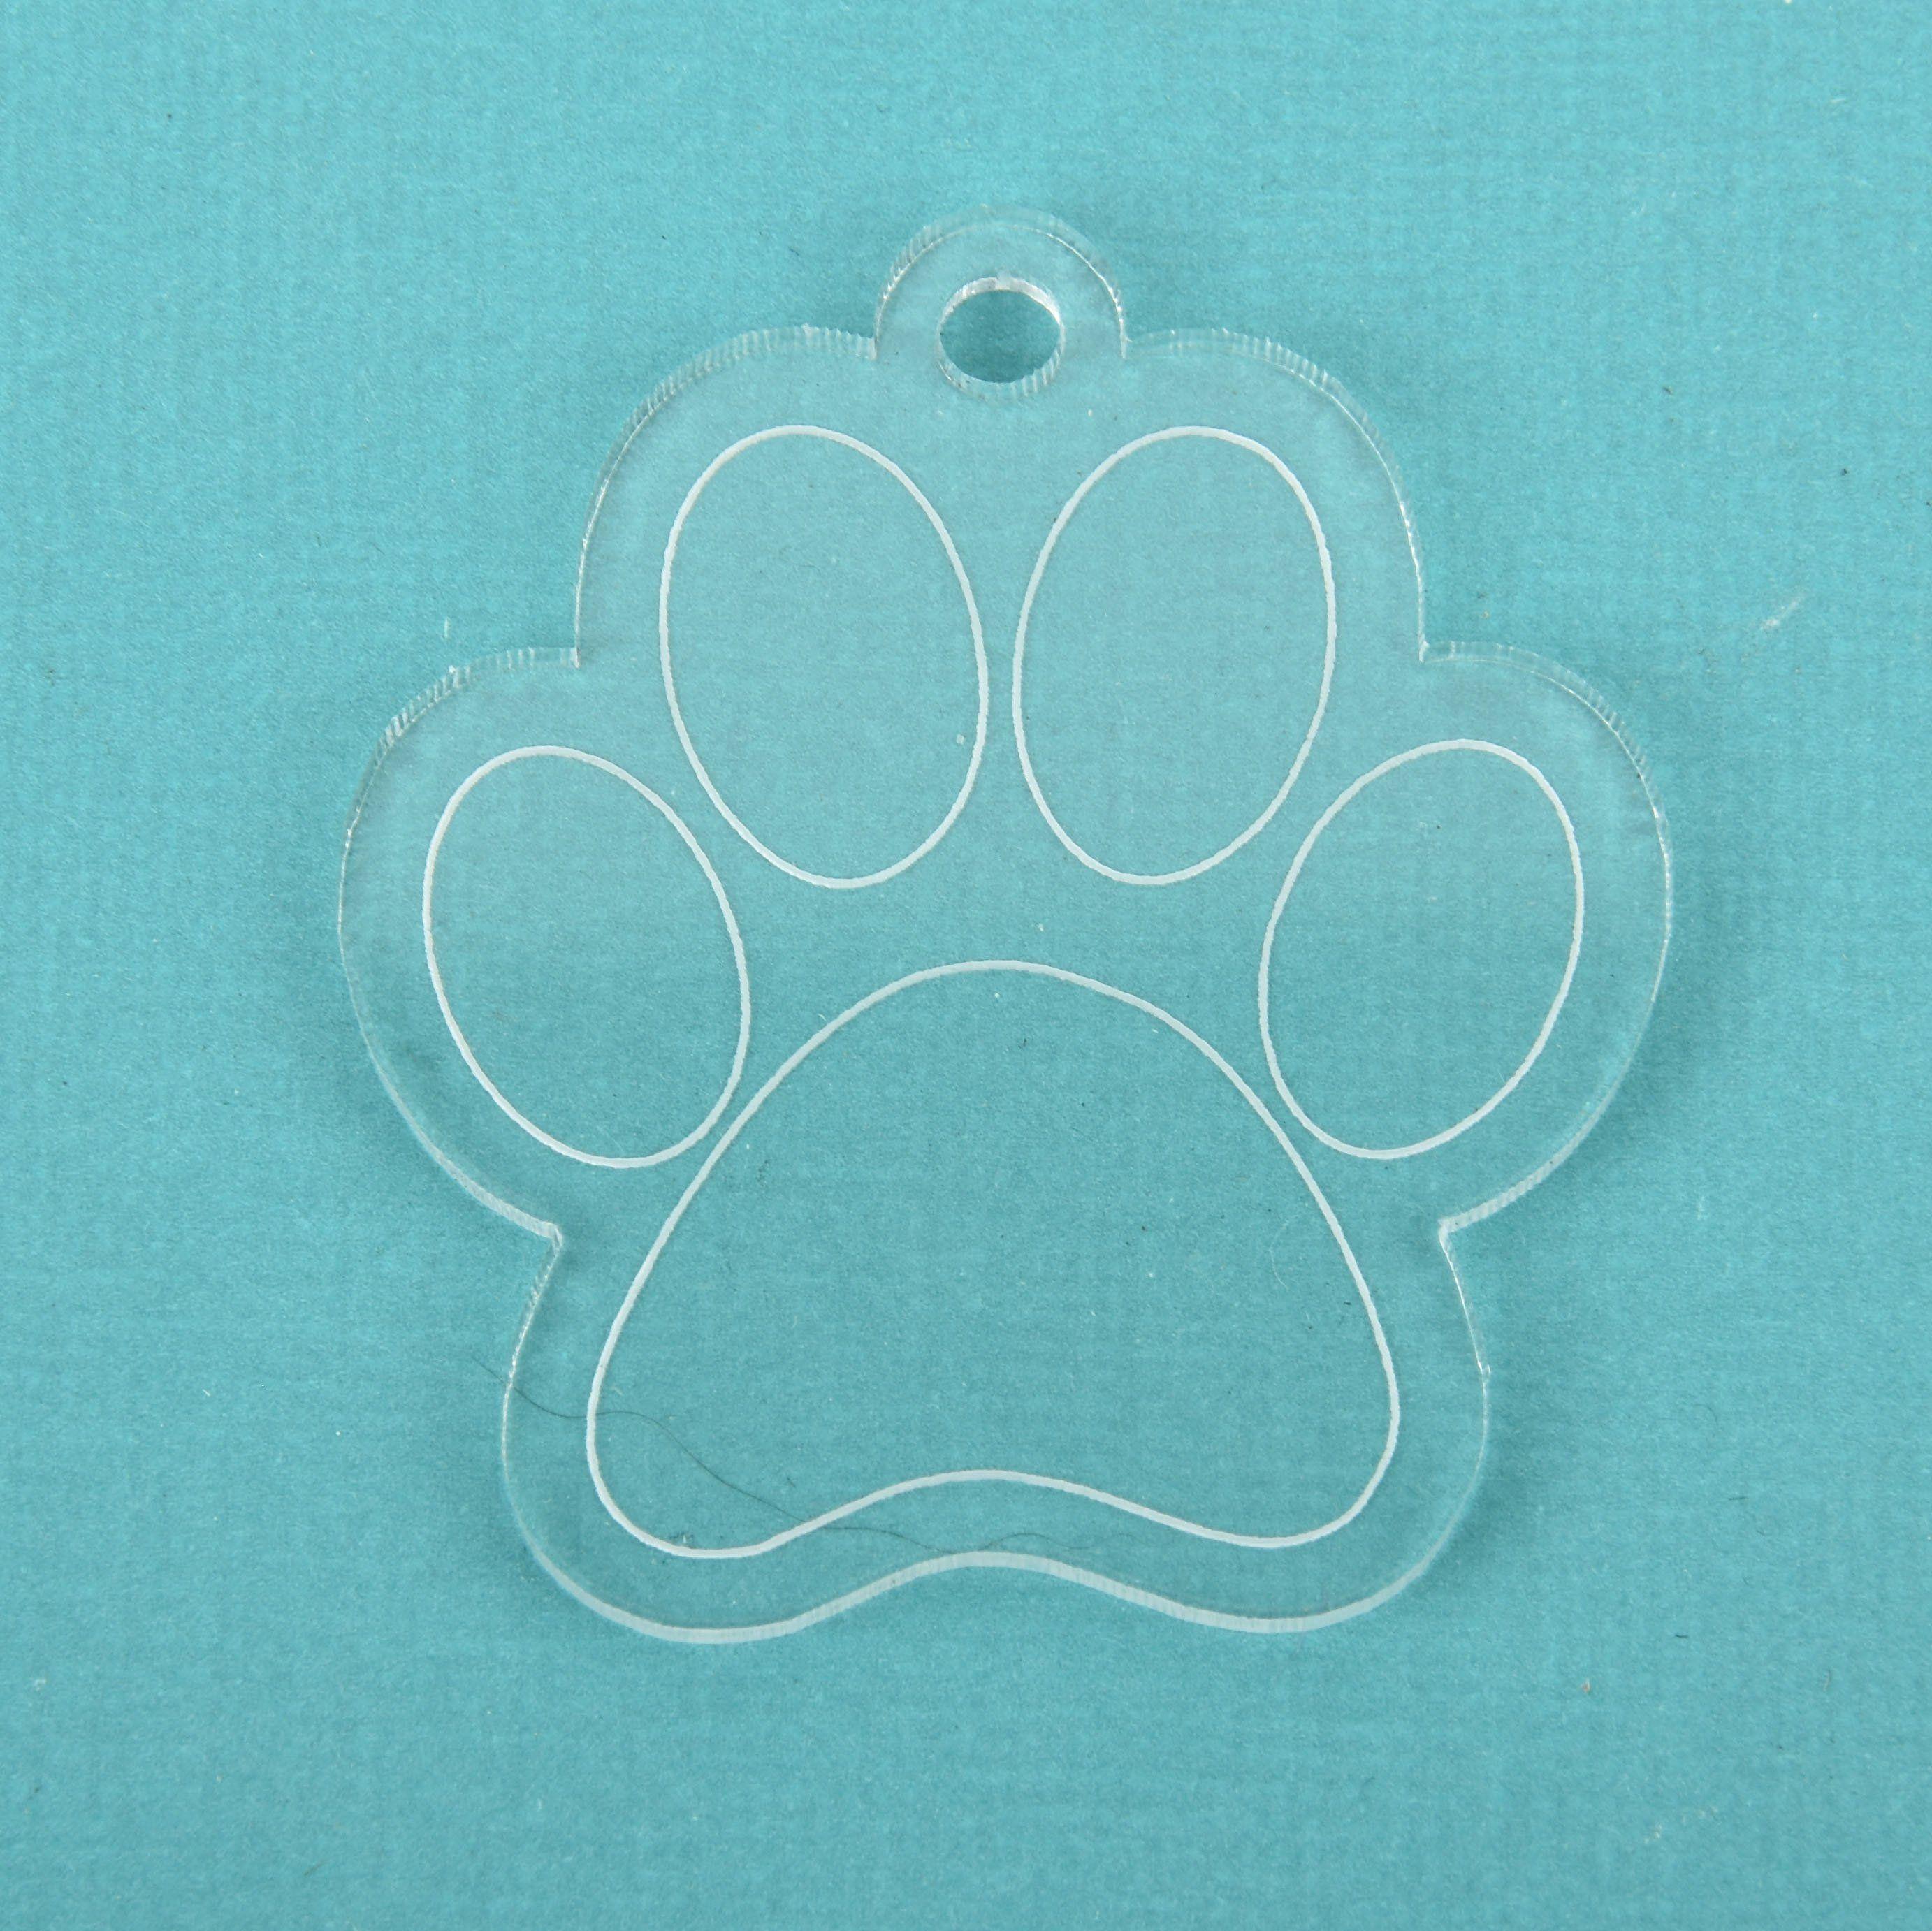 65fa9d5f4c3 Fabric Samples · 5 Clear PAW PRINT Acrylic blanks 2